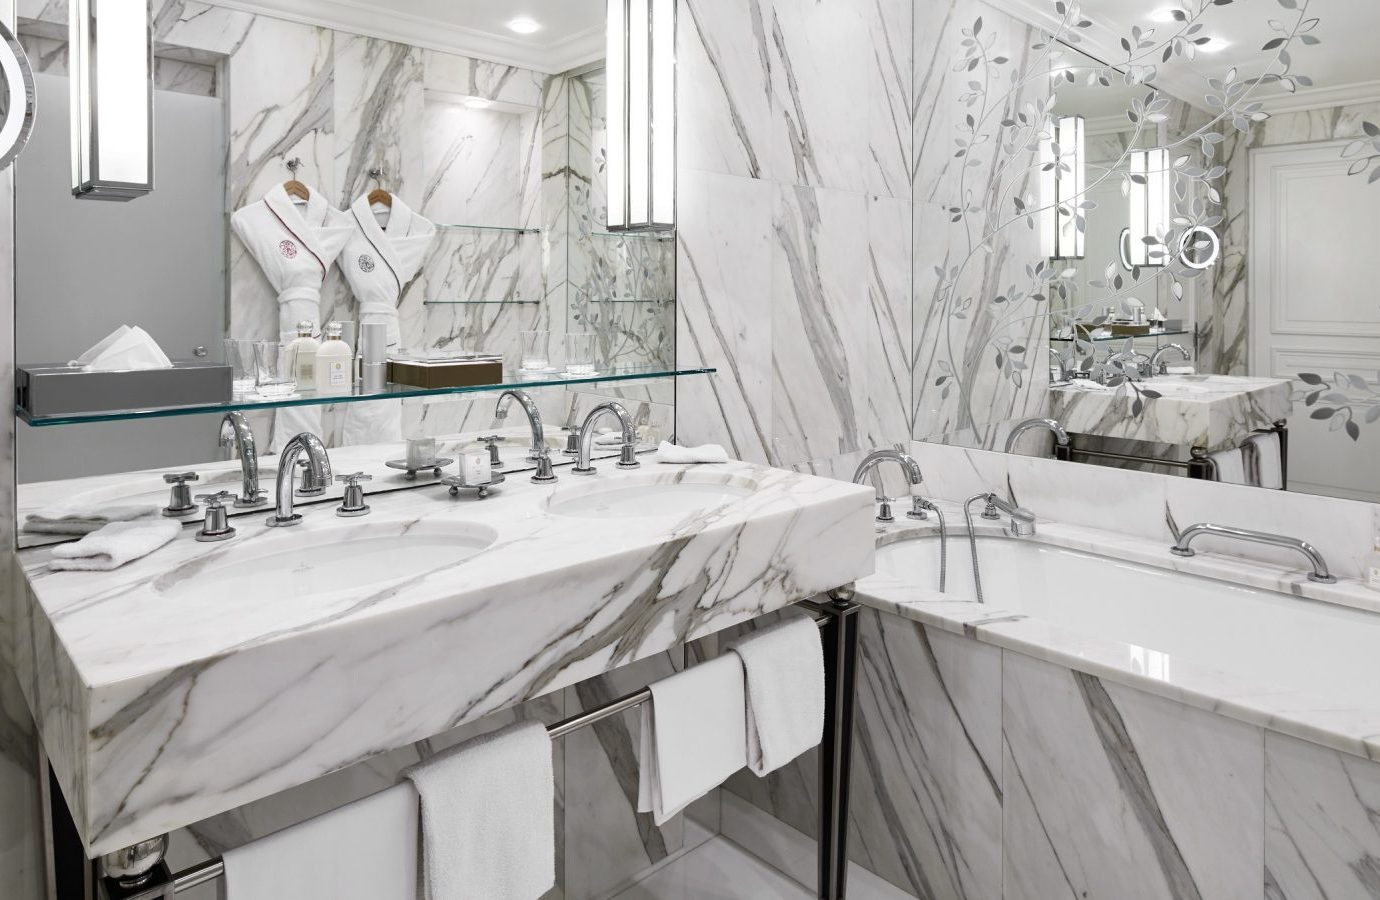 Bathroom at Hotel Plaza Athenee